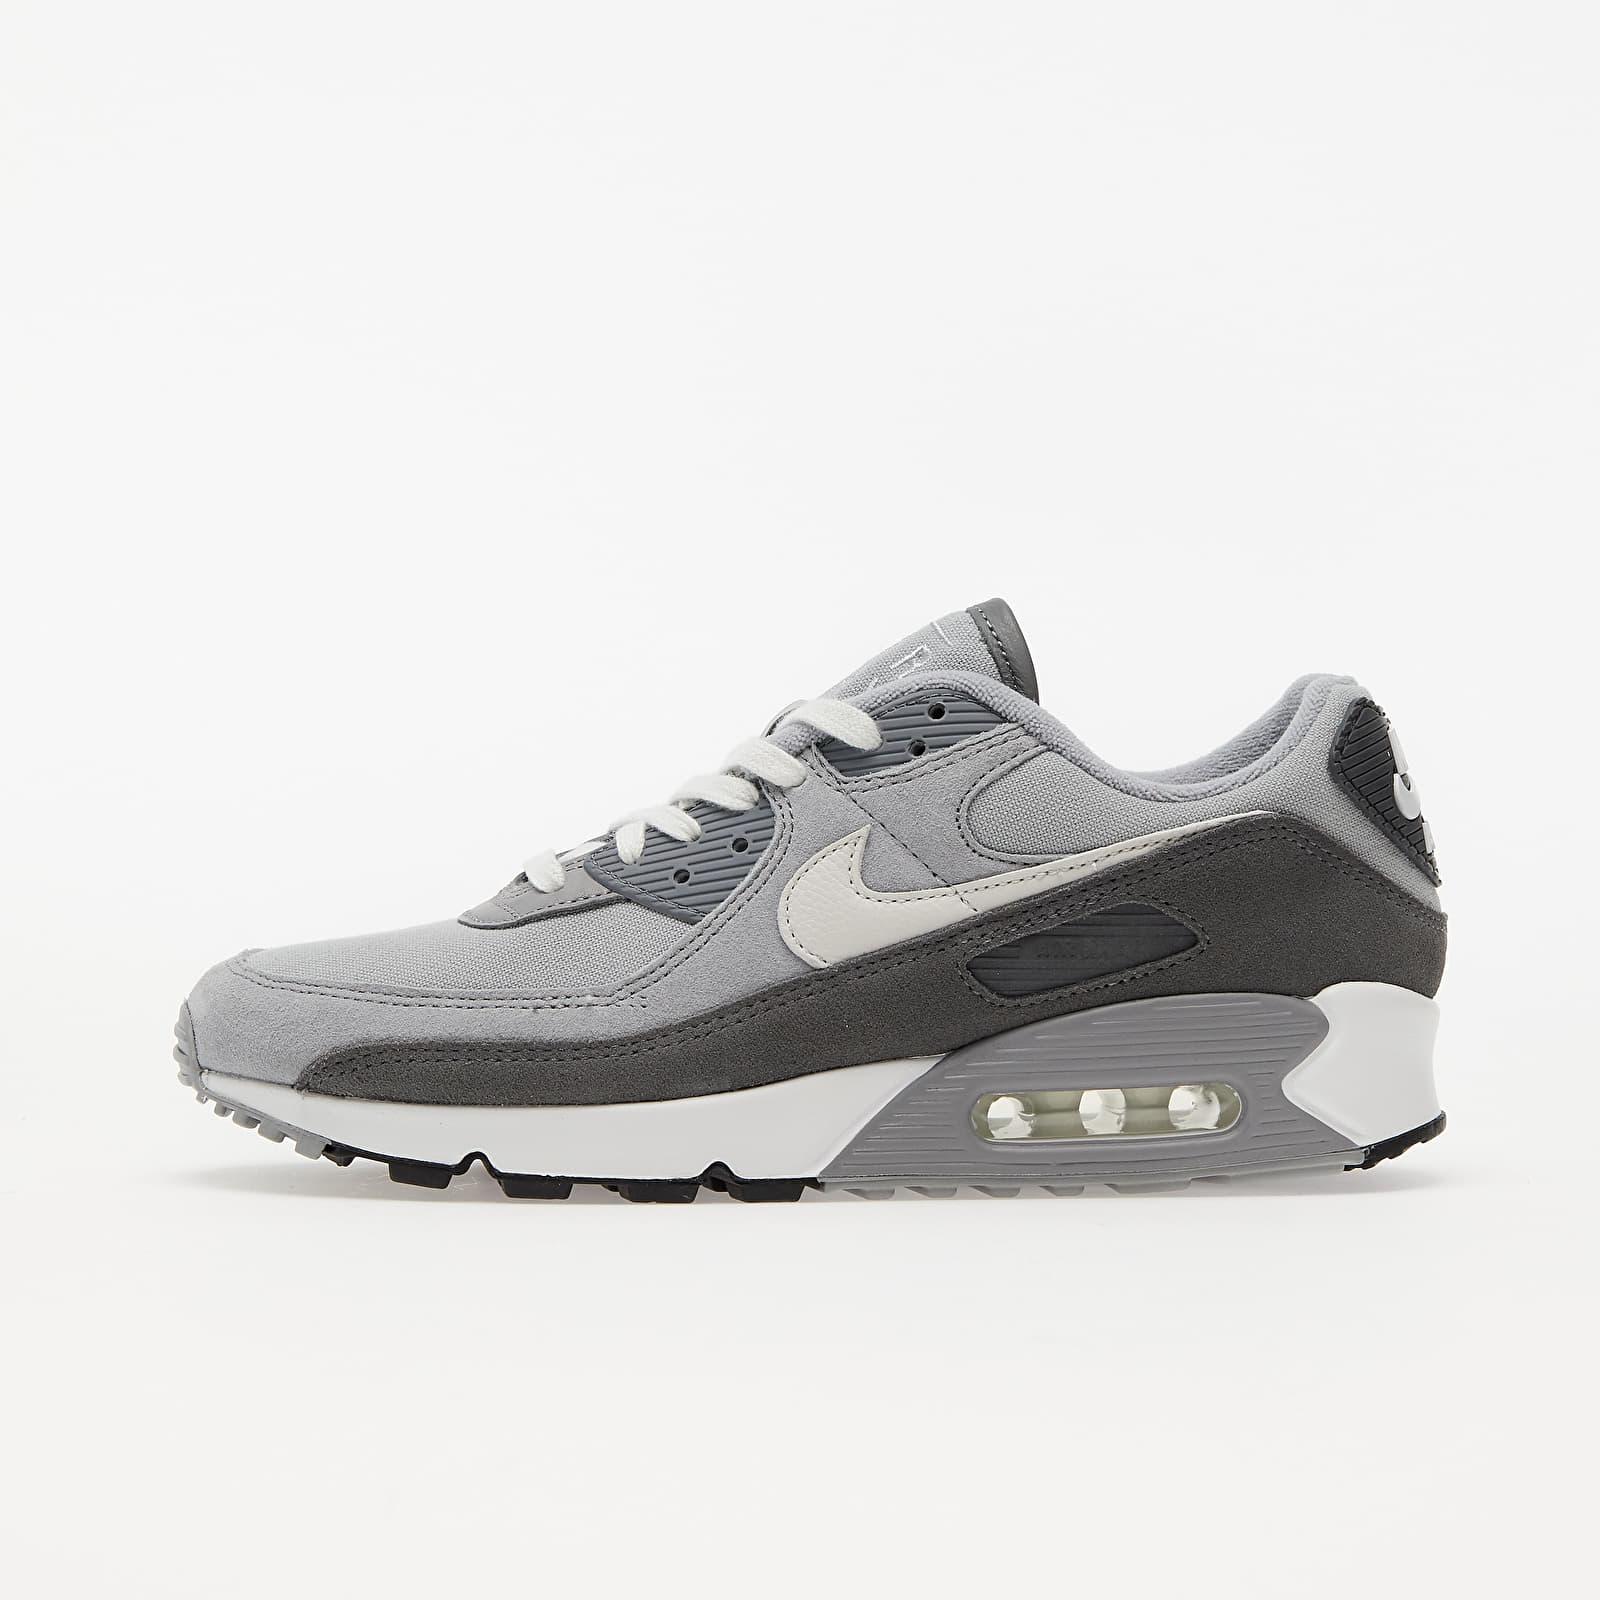 Nike Air Max 90 Premium Lt Smoke Grey/ White-Particle Grey EUR 42